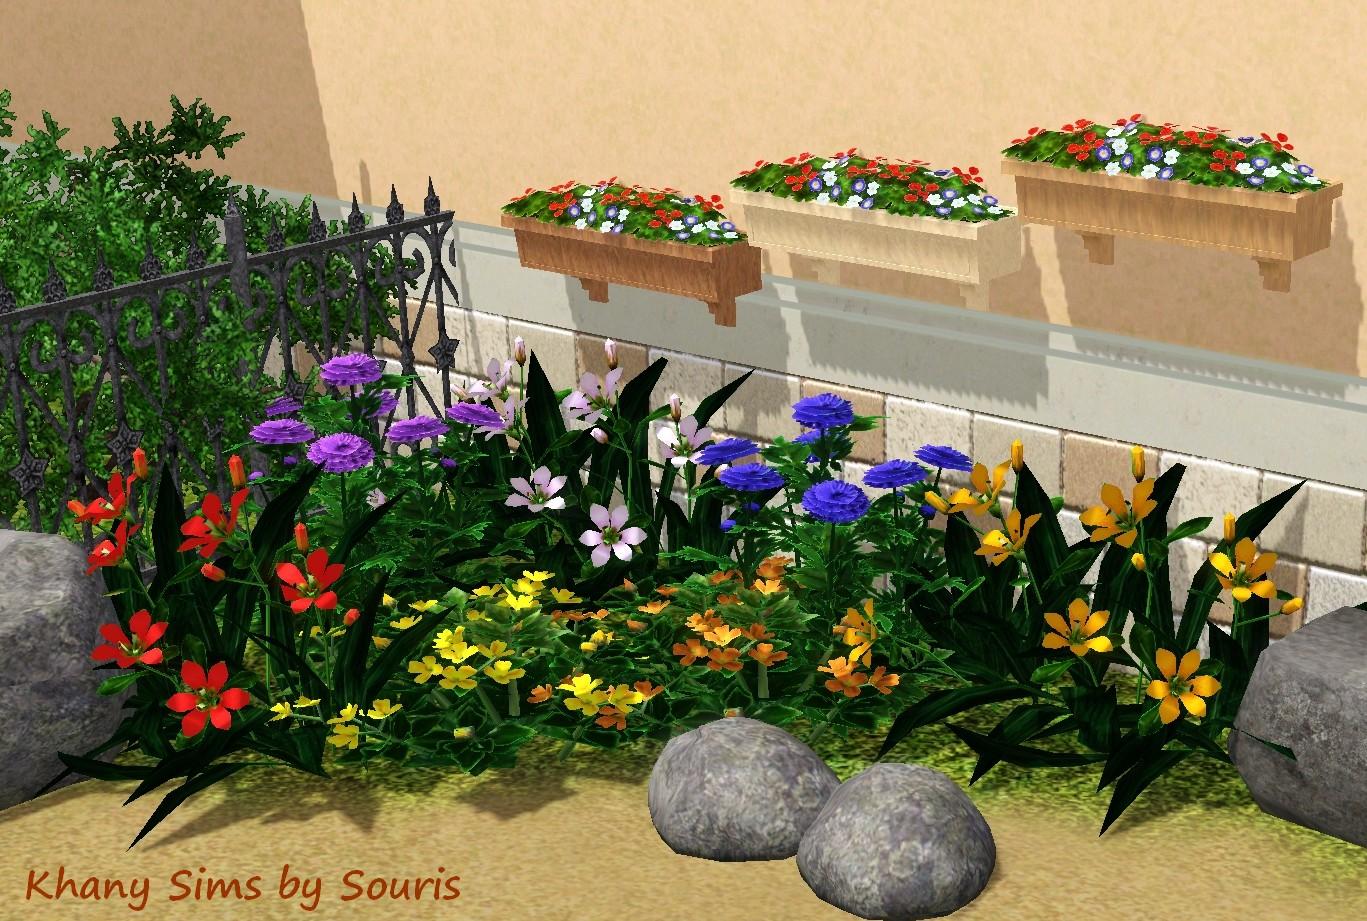 Sims3 sylvanes adult scene